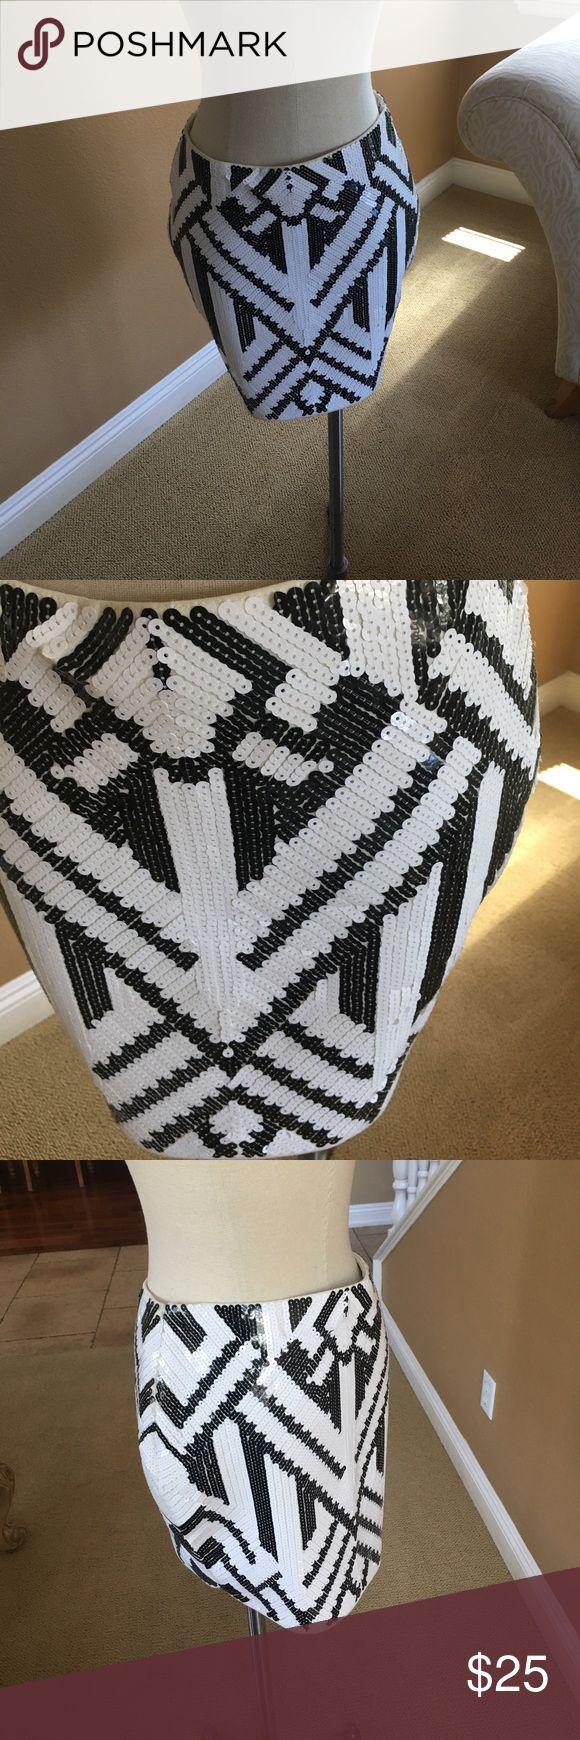 Sequin black and white mini skirt sz L Black and white sequin skirt ANGL Skirts Mini